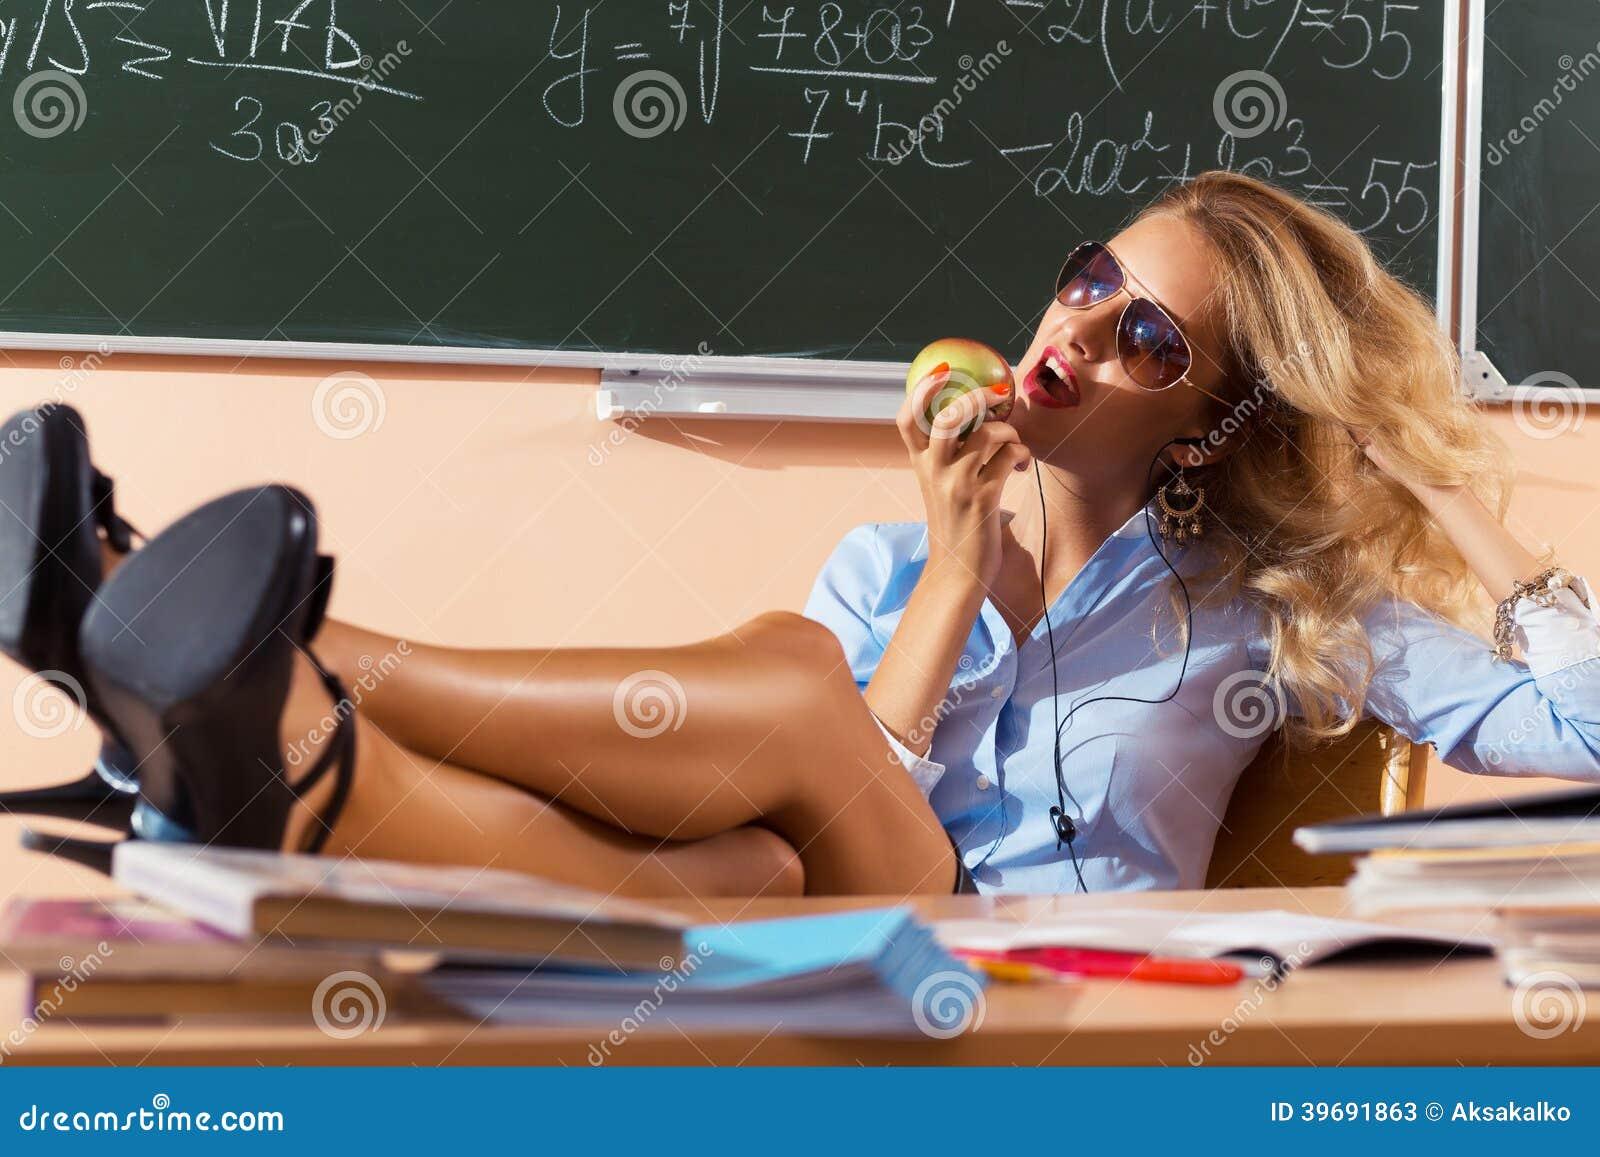 Beautiful Young Sexy Teacher Stock Photo - Image: 39691863: http://www.dreamstime.com/stock-photos-beautiful-young-sexy-teacher-resting-classes-image39691863